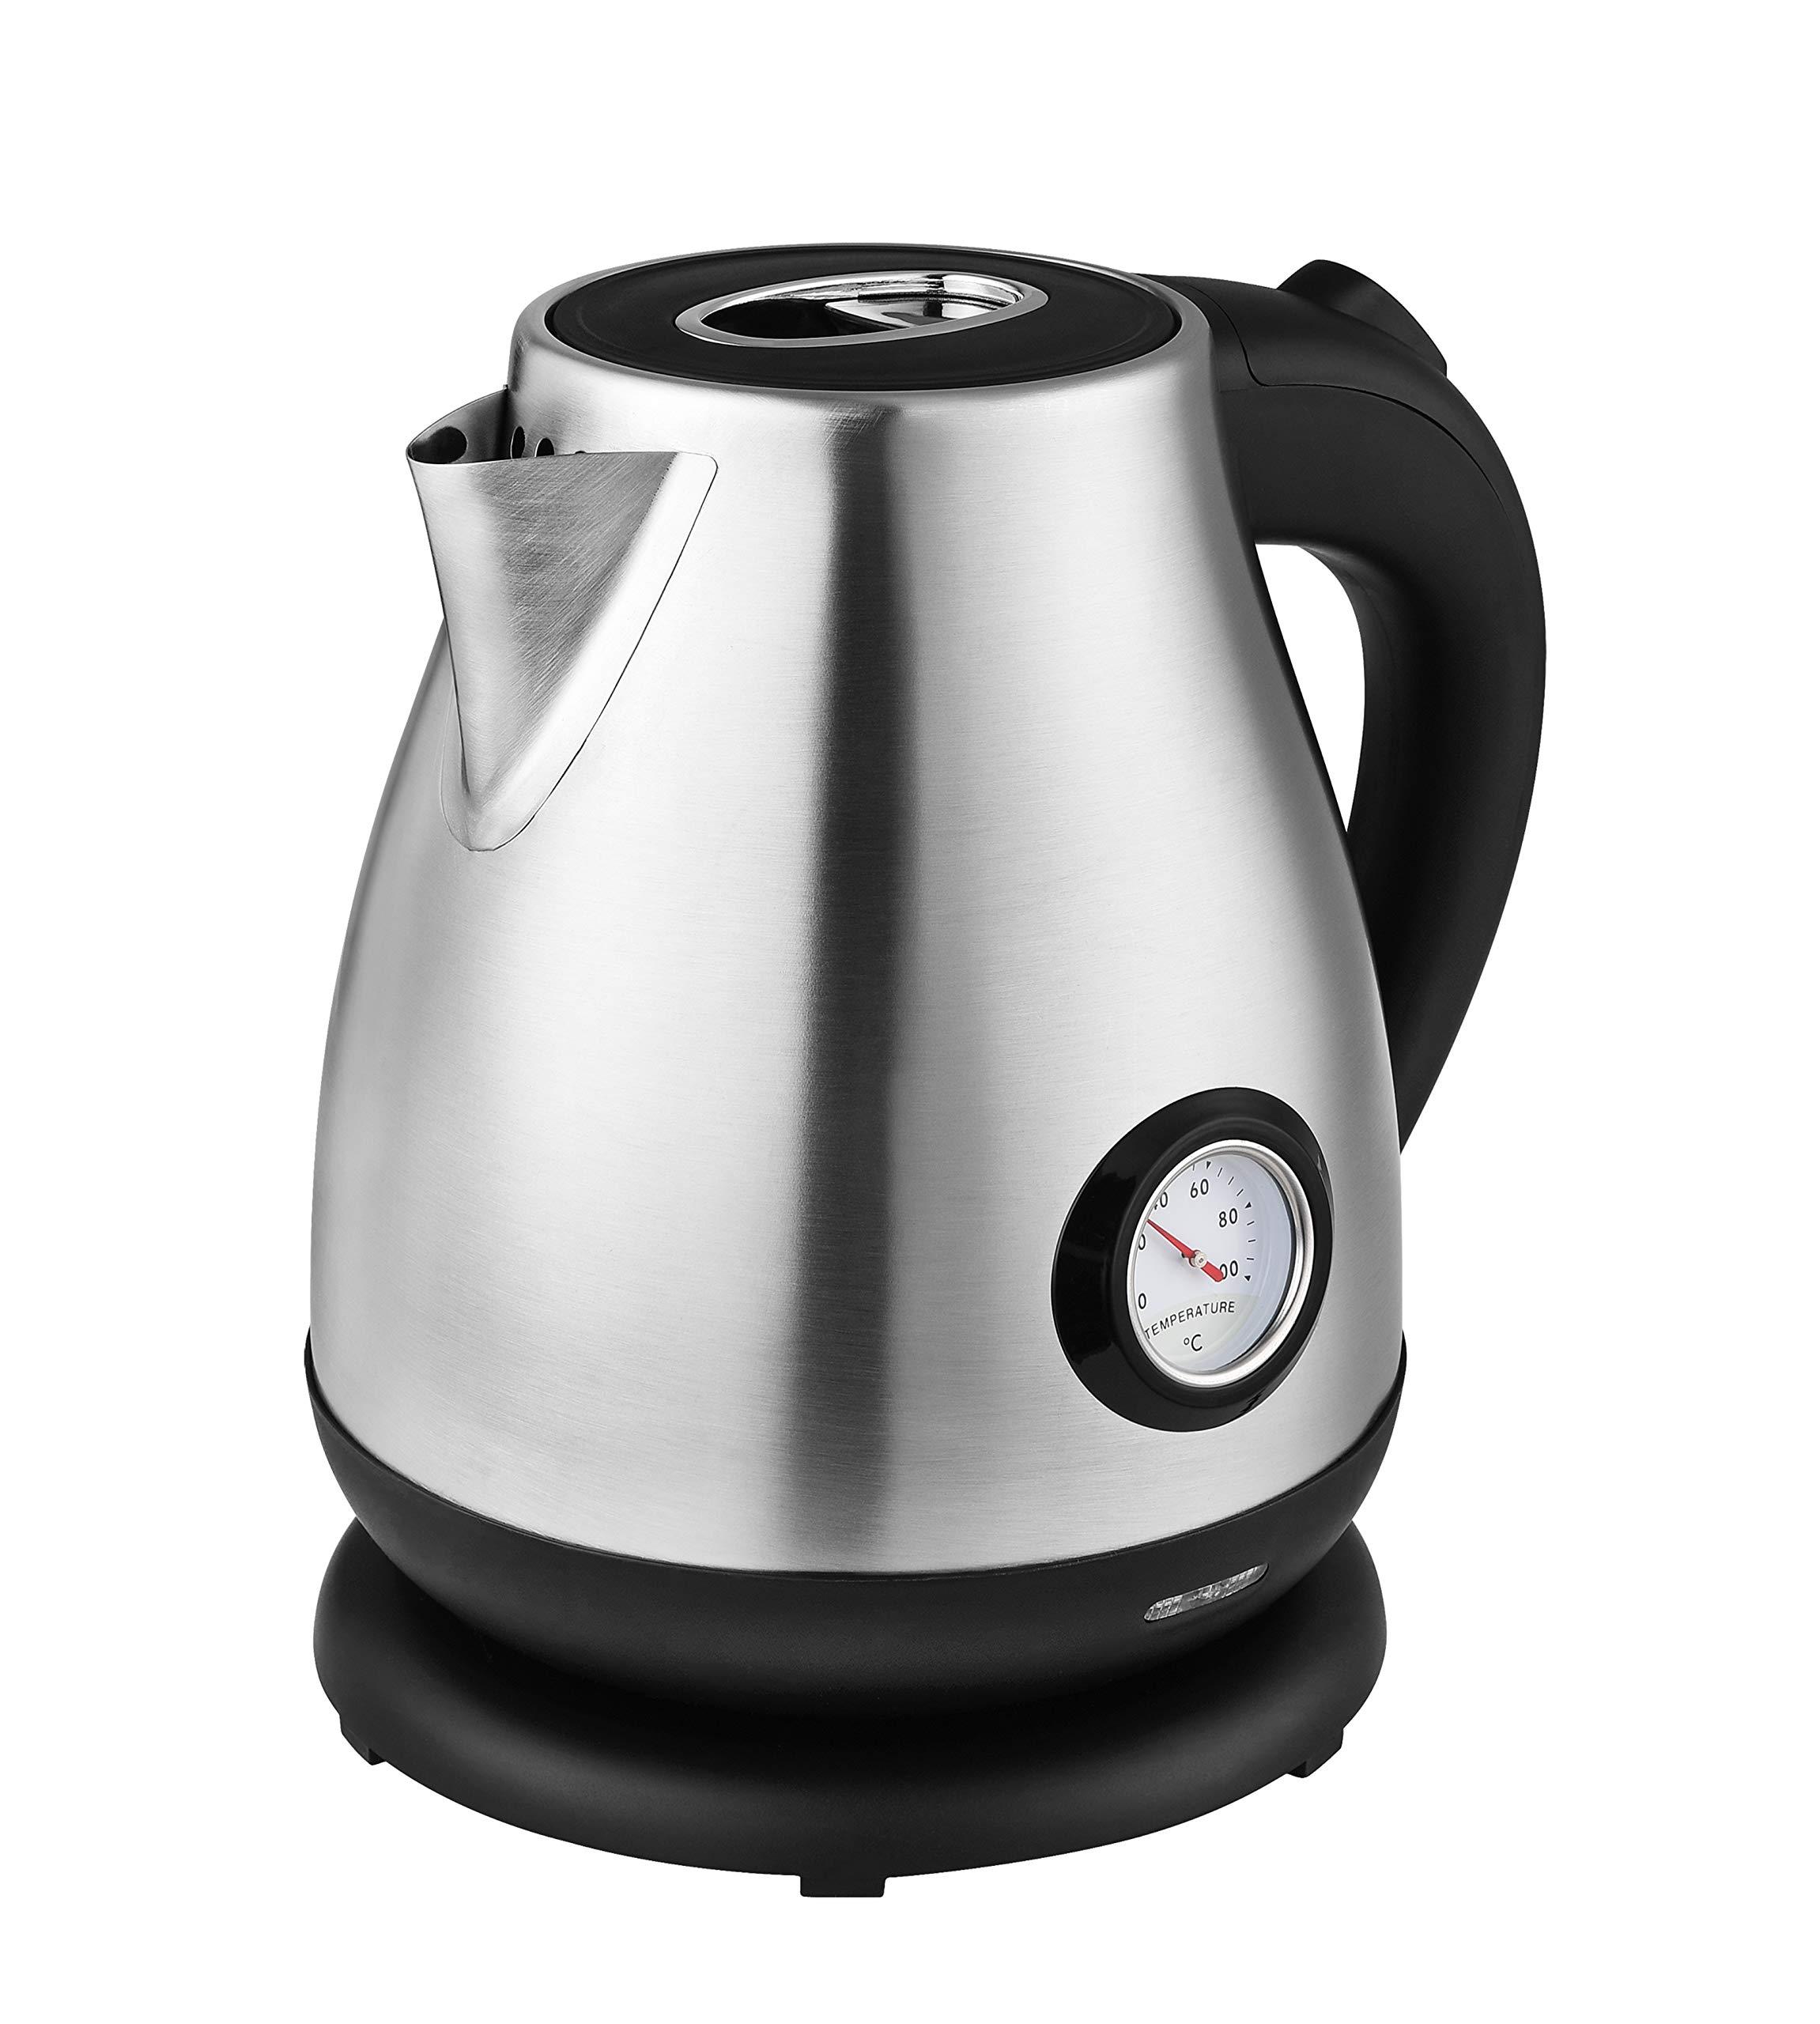 Venga-VG-JK-3002-Wasserkocher-2200-Edelstahl-Kunststoff-17-liters-Silber